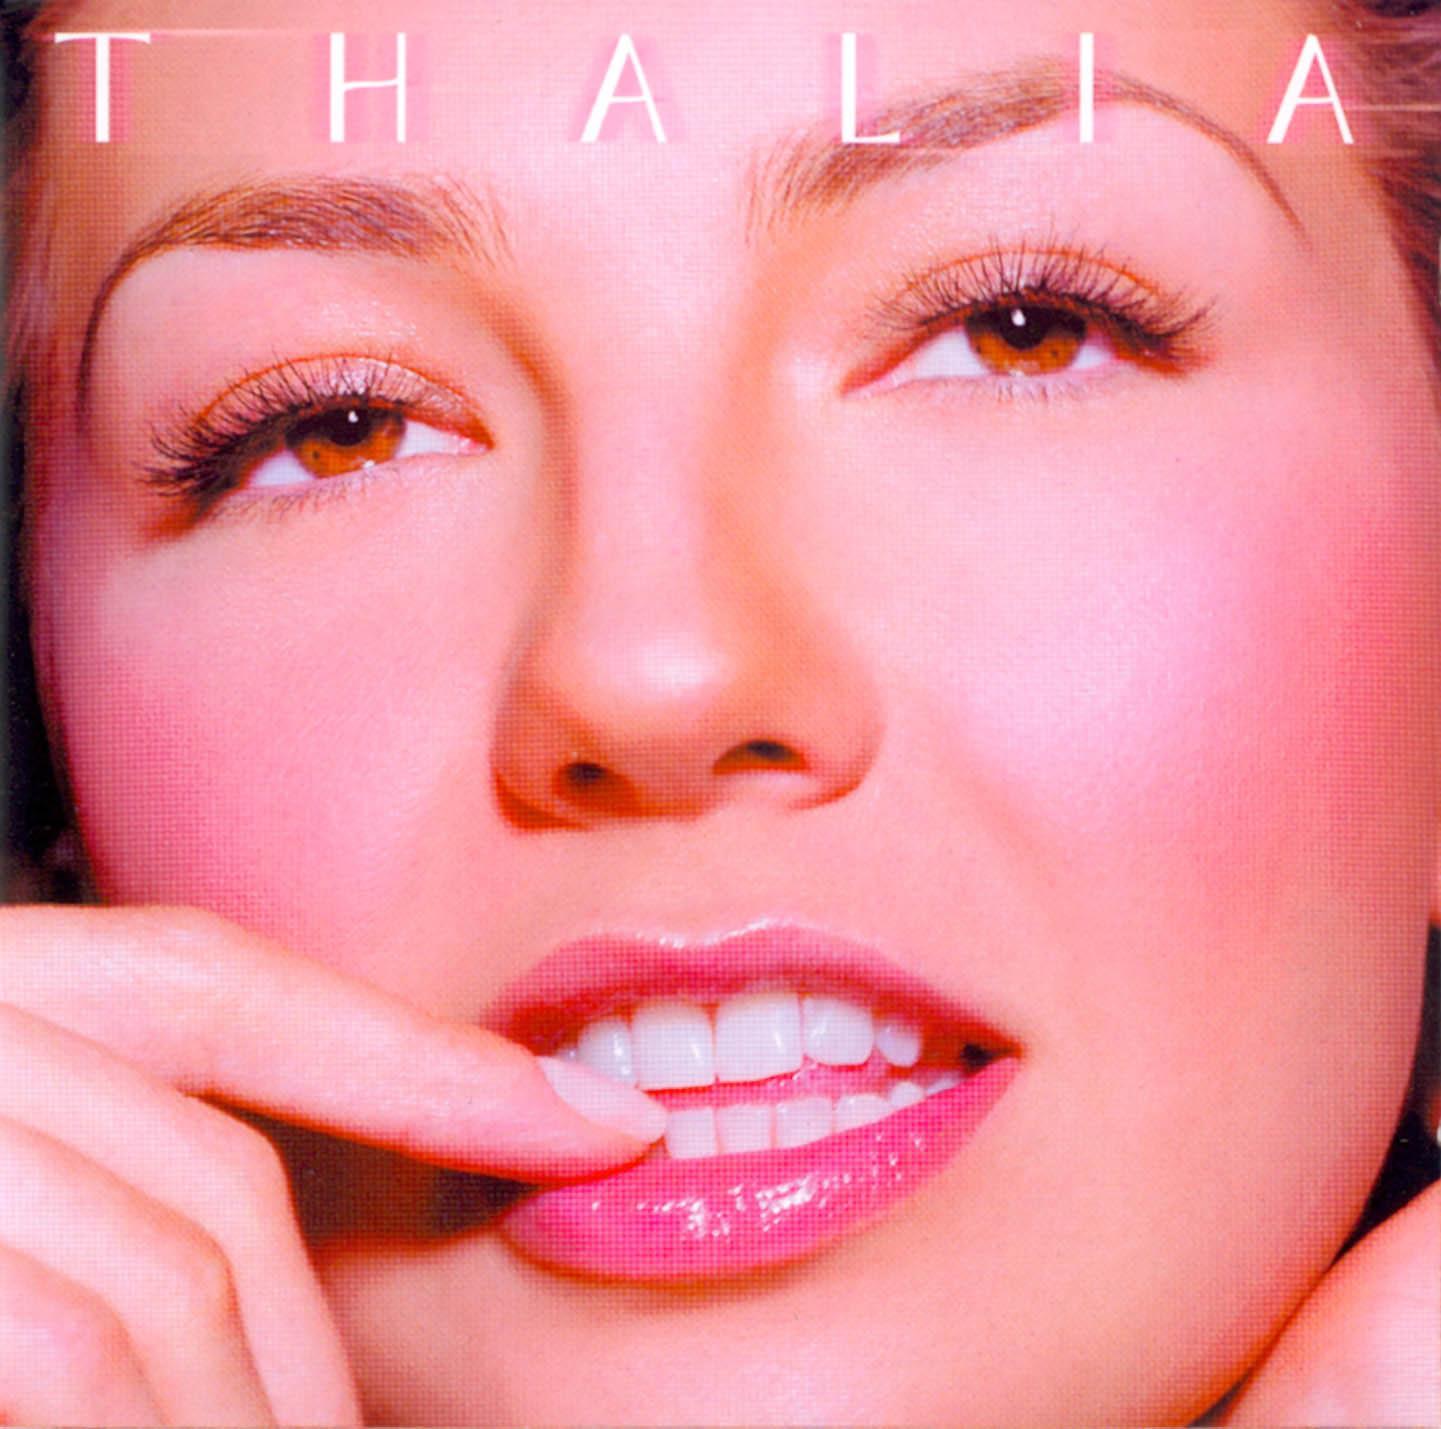 Thalia-Arrasando-Frontal.jpg